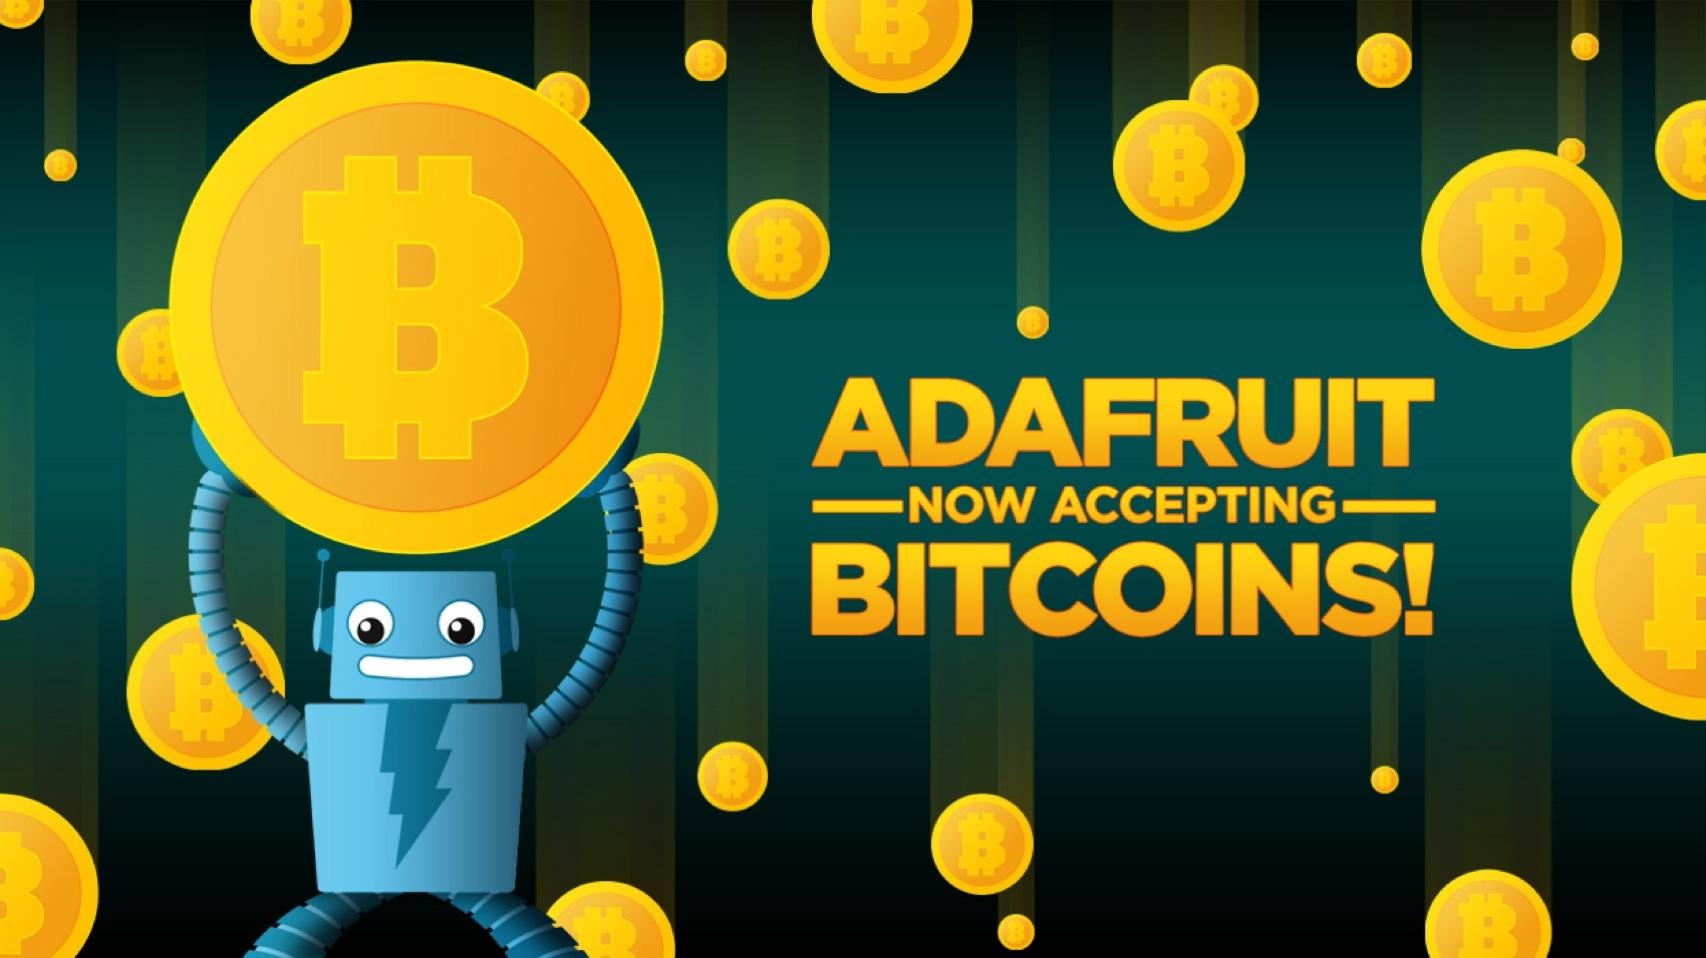 1280X698 Adafruit Bitcoin Banner-1